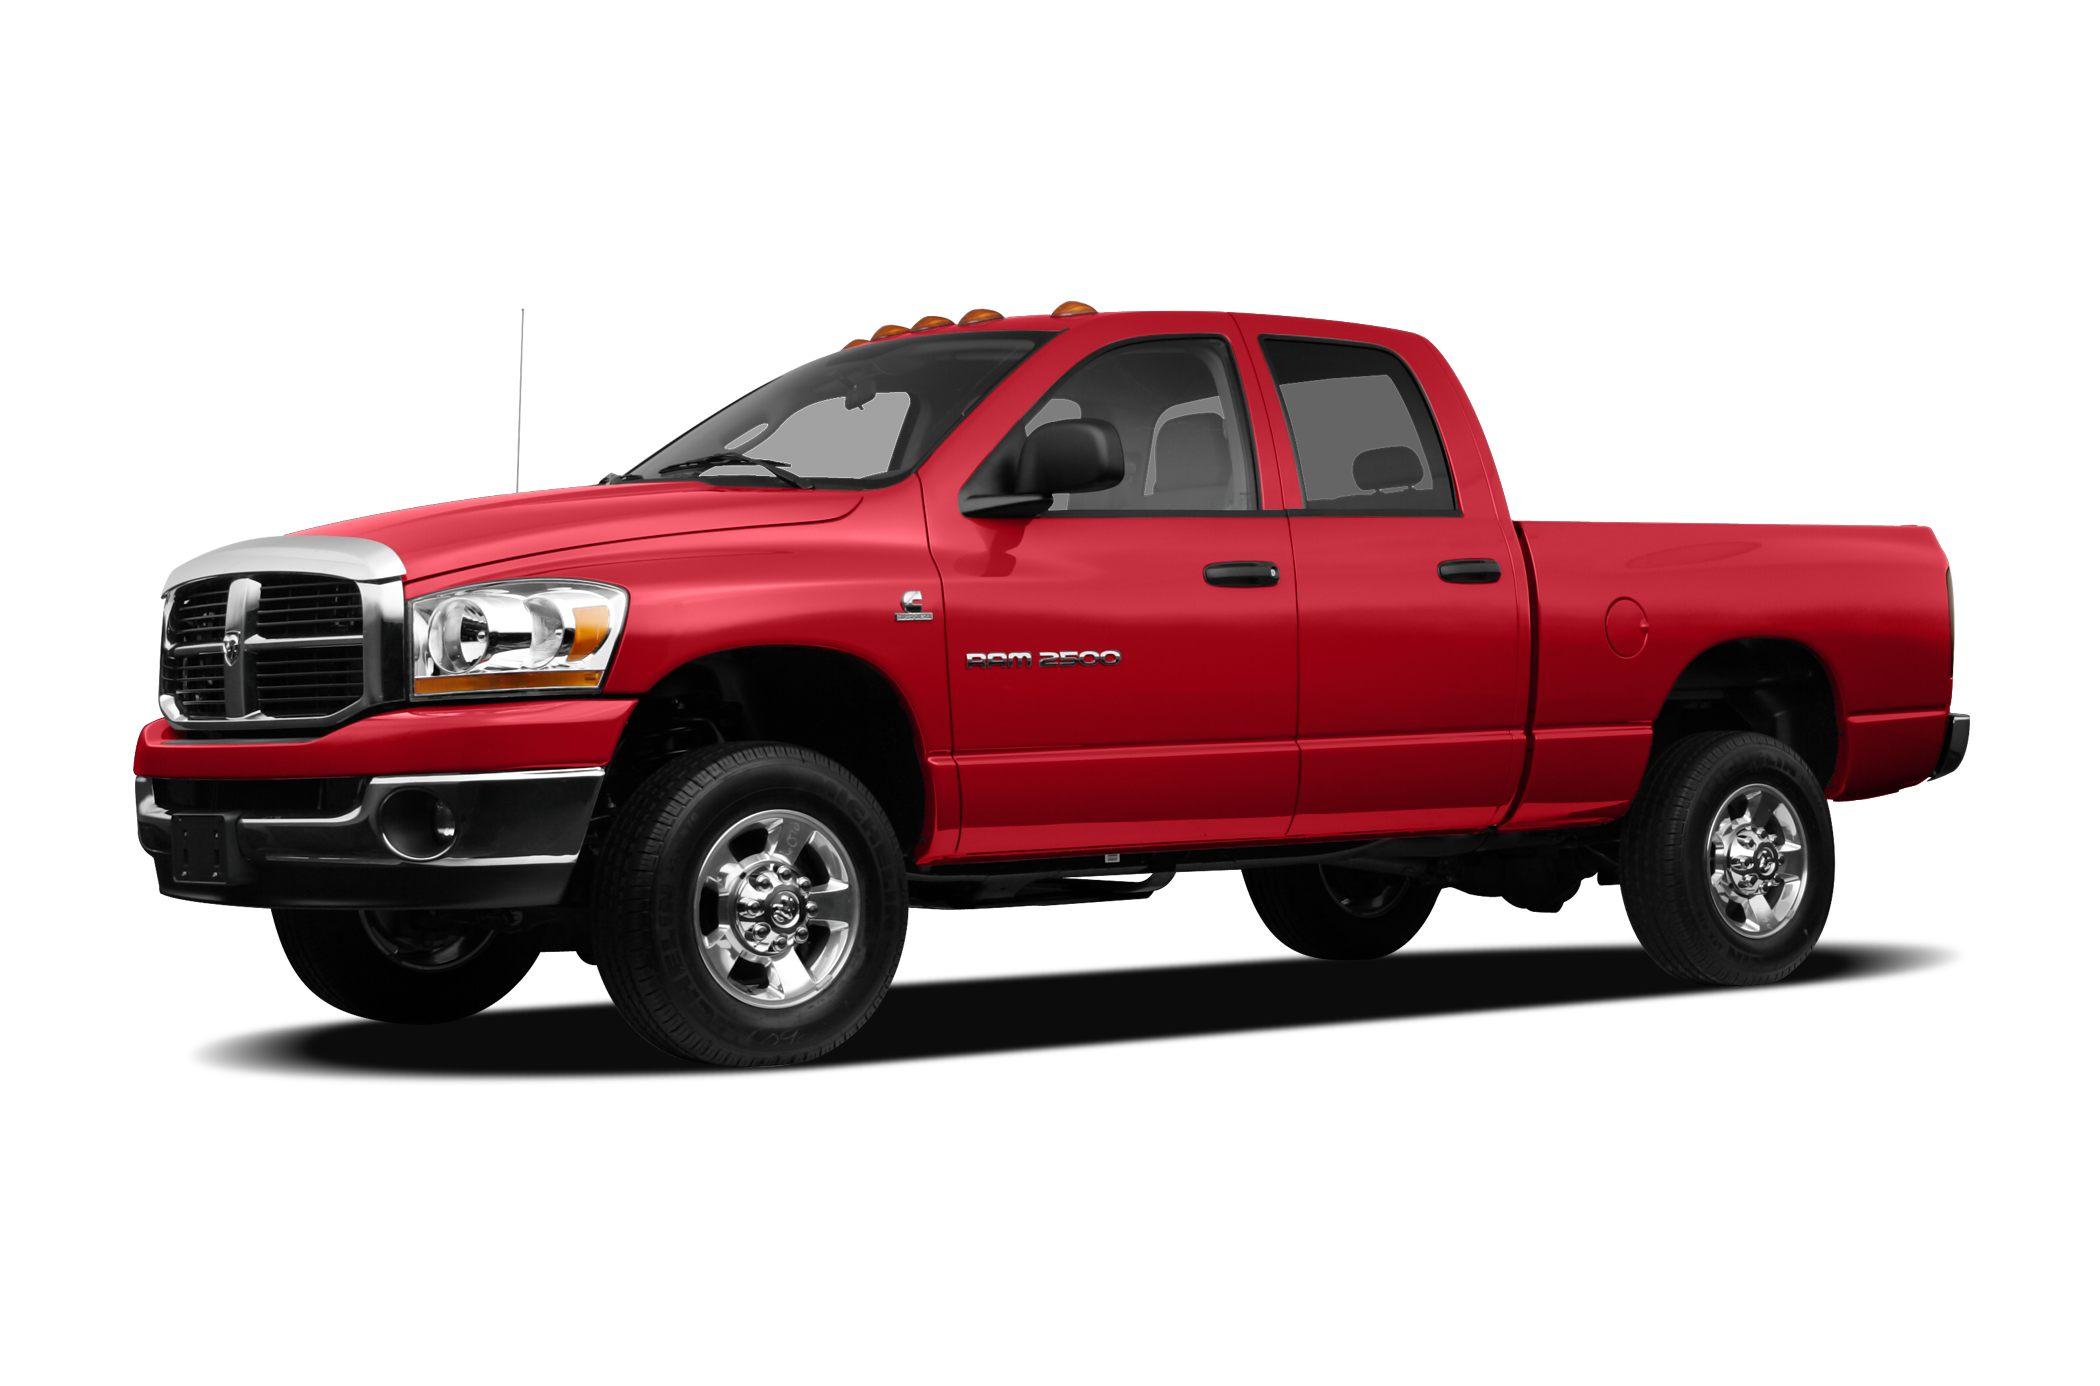 2007 Dodge Ram 2500  Miles 88787Color Gray Stock 16296 VIN 1D7KS28D97J536039